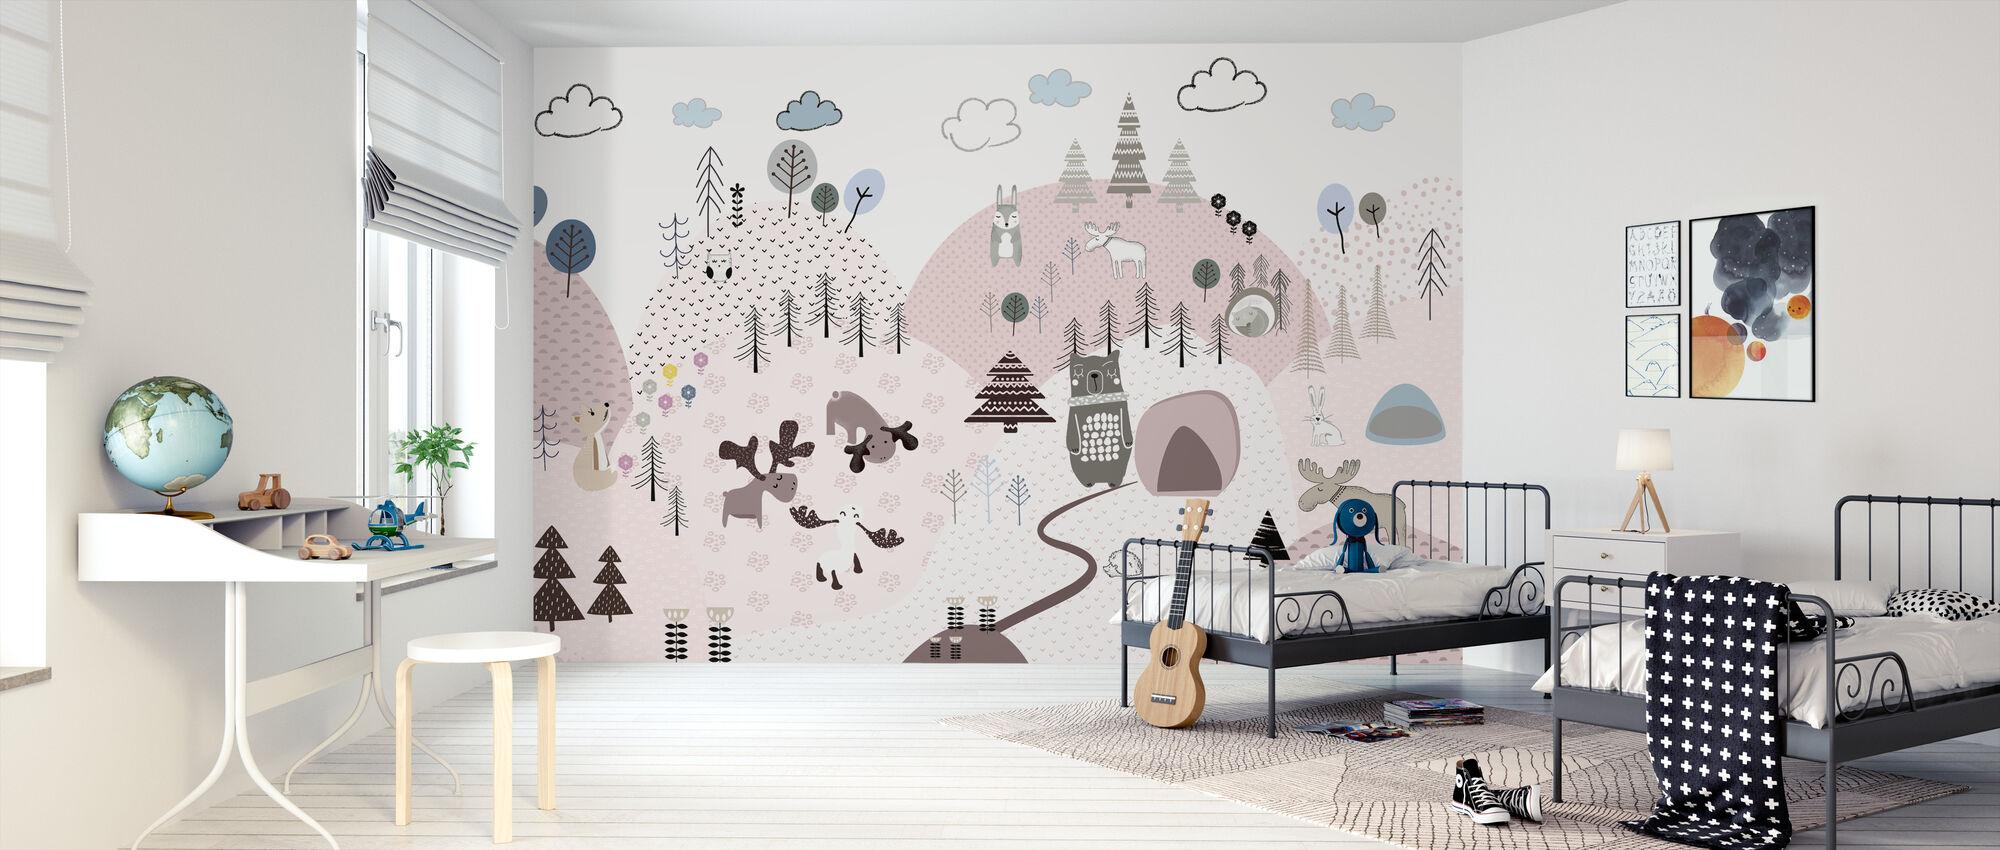 Animal Community III - Wallpaper - Kids Room